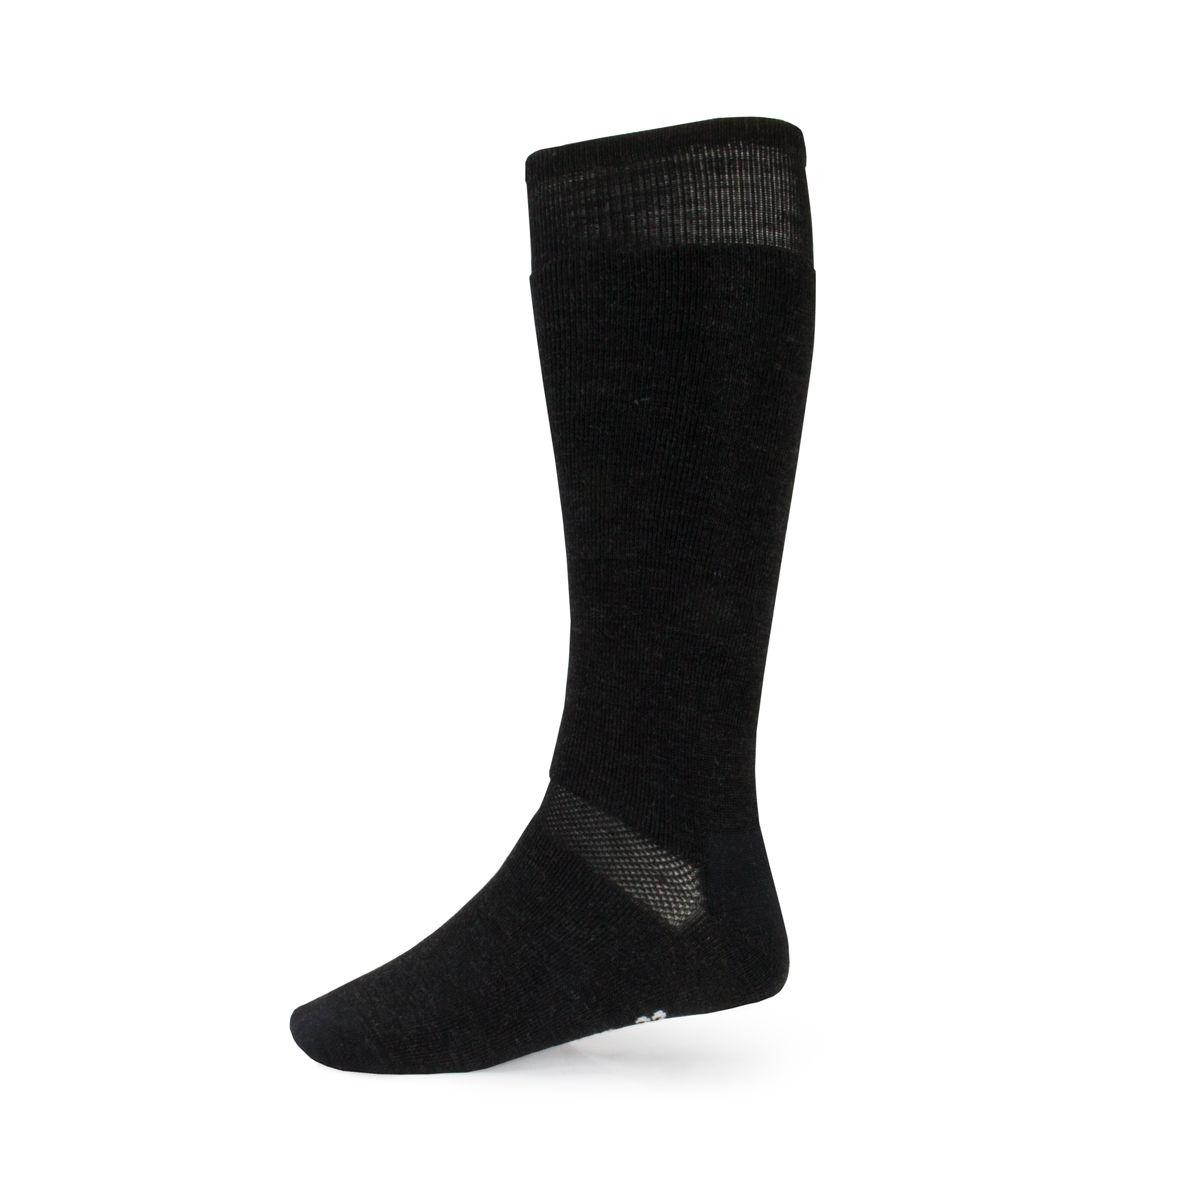 Minus33: Merino Wool Ski and Snowboard Sock - Style 905